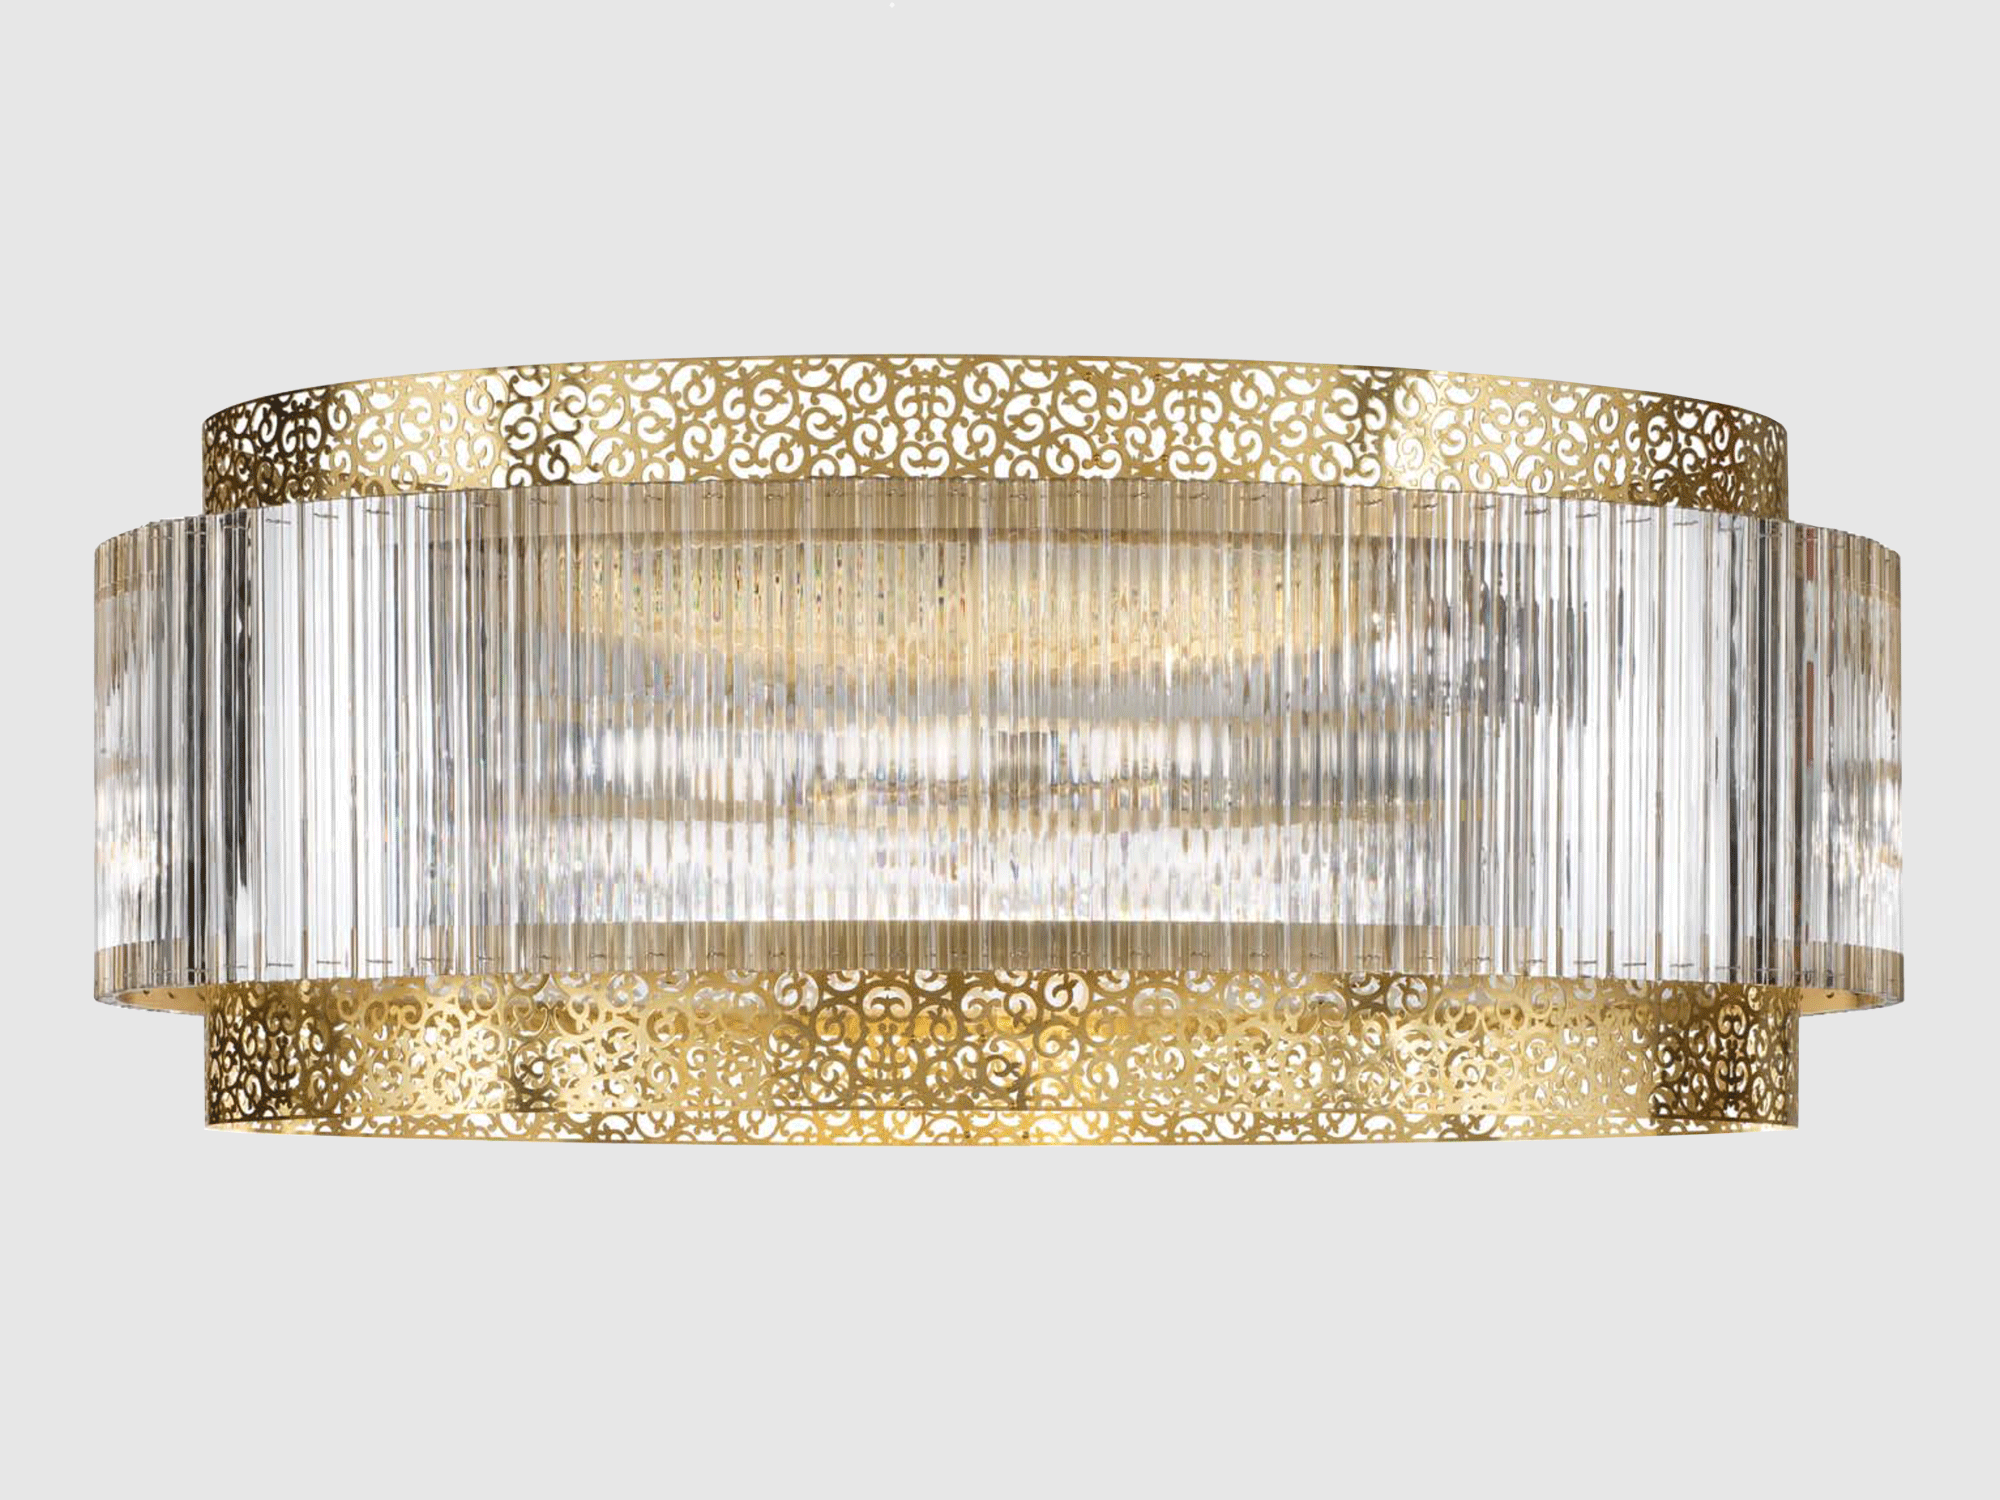 NARCISO CHANDELIER - baldi home jewels, 2010